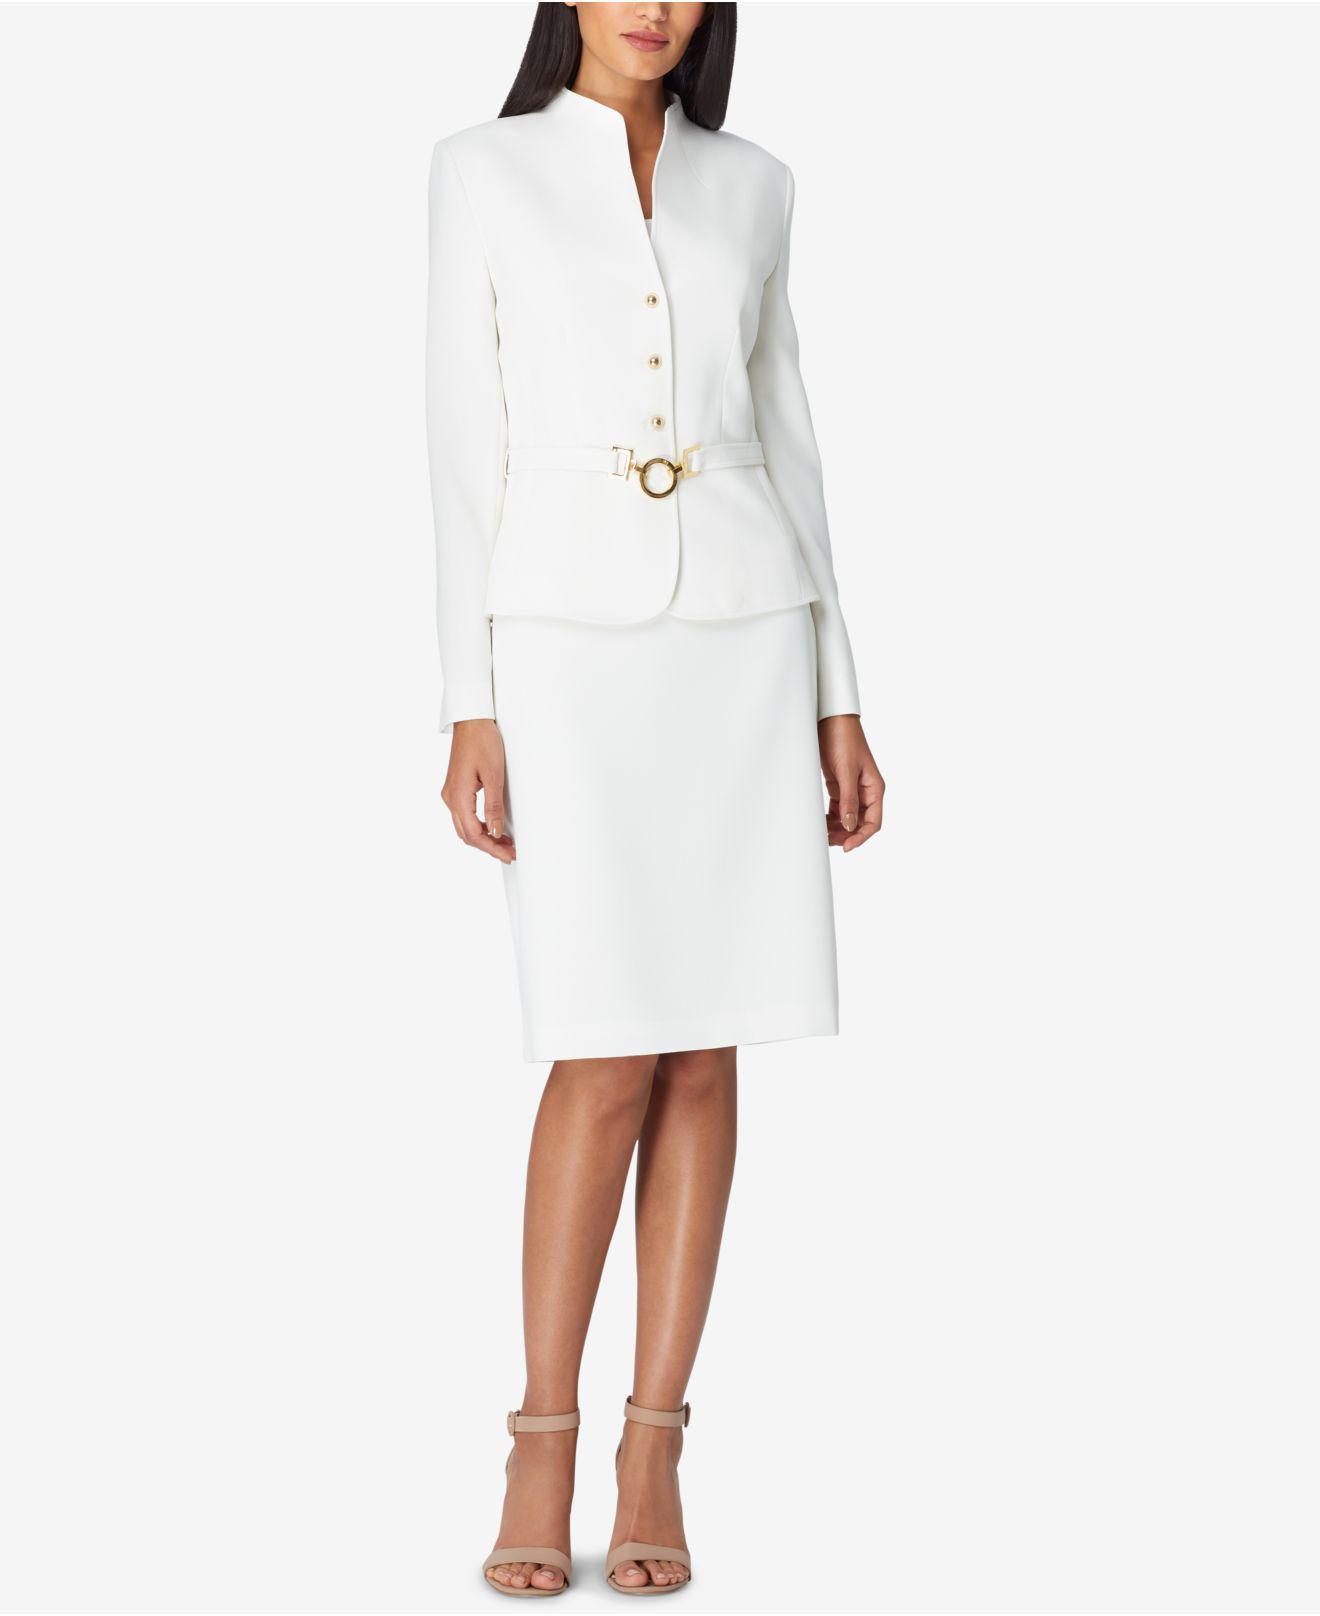 08ca8617b White Skirt Suit Petite – DACC